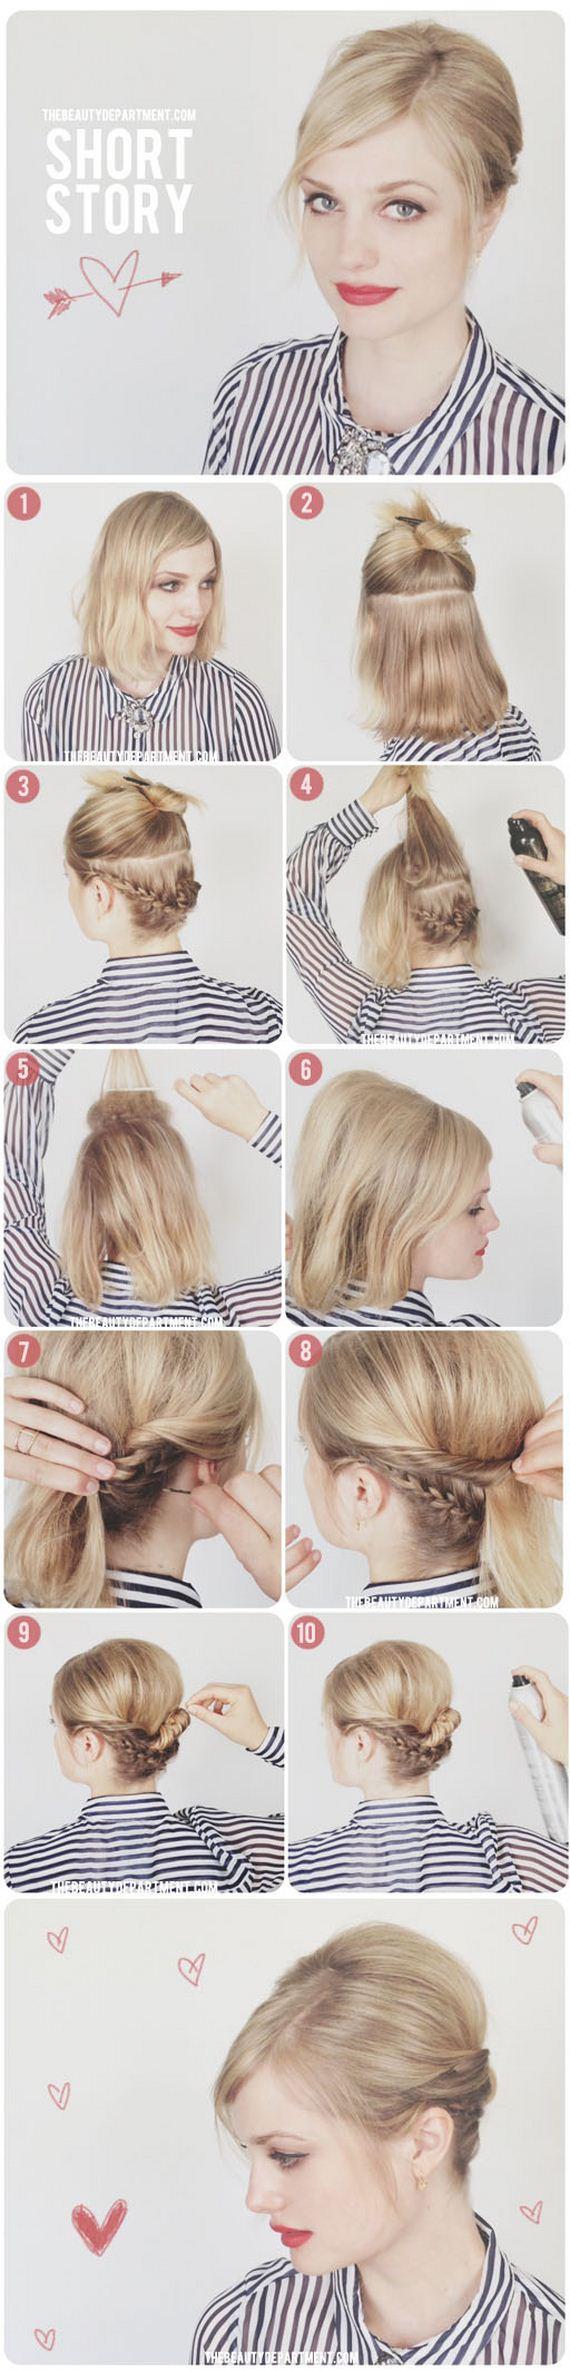 02-Short-Hairstyles